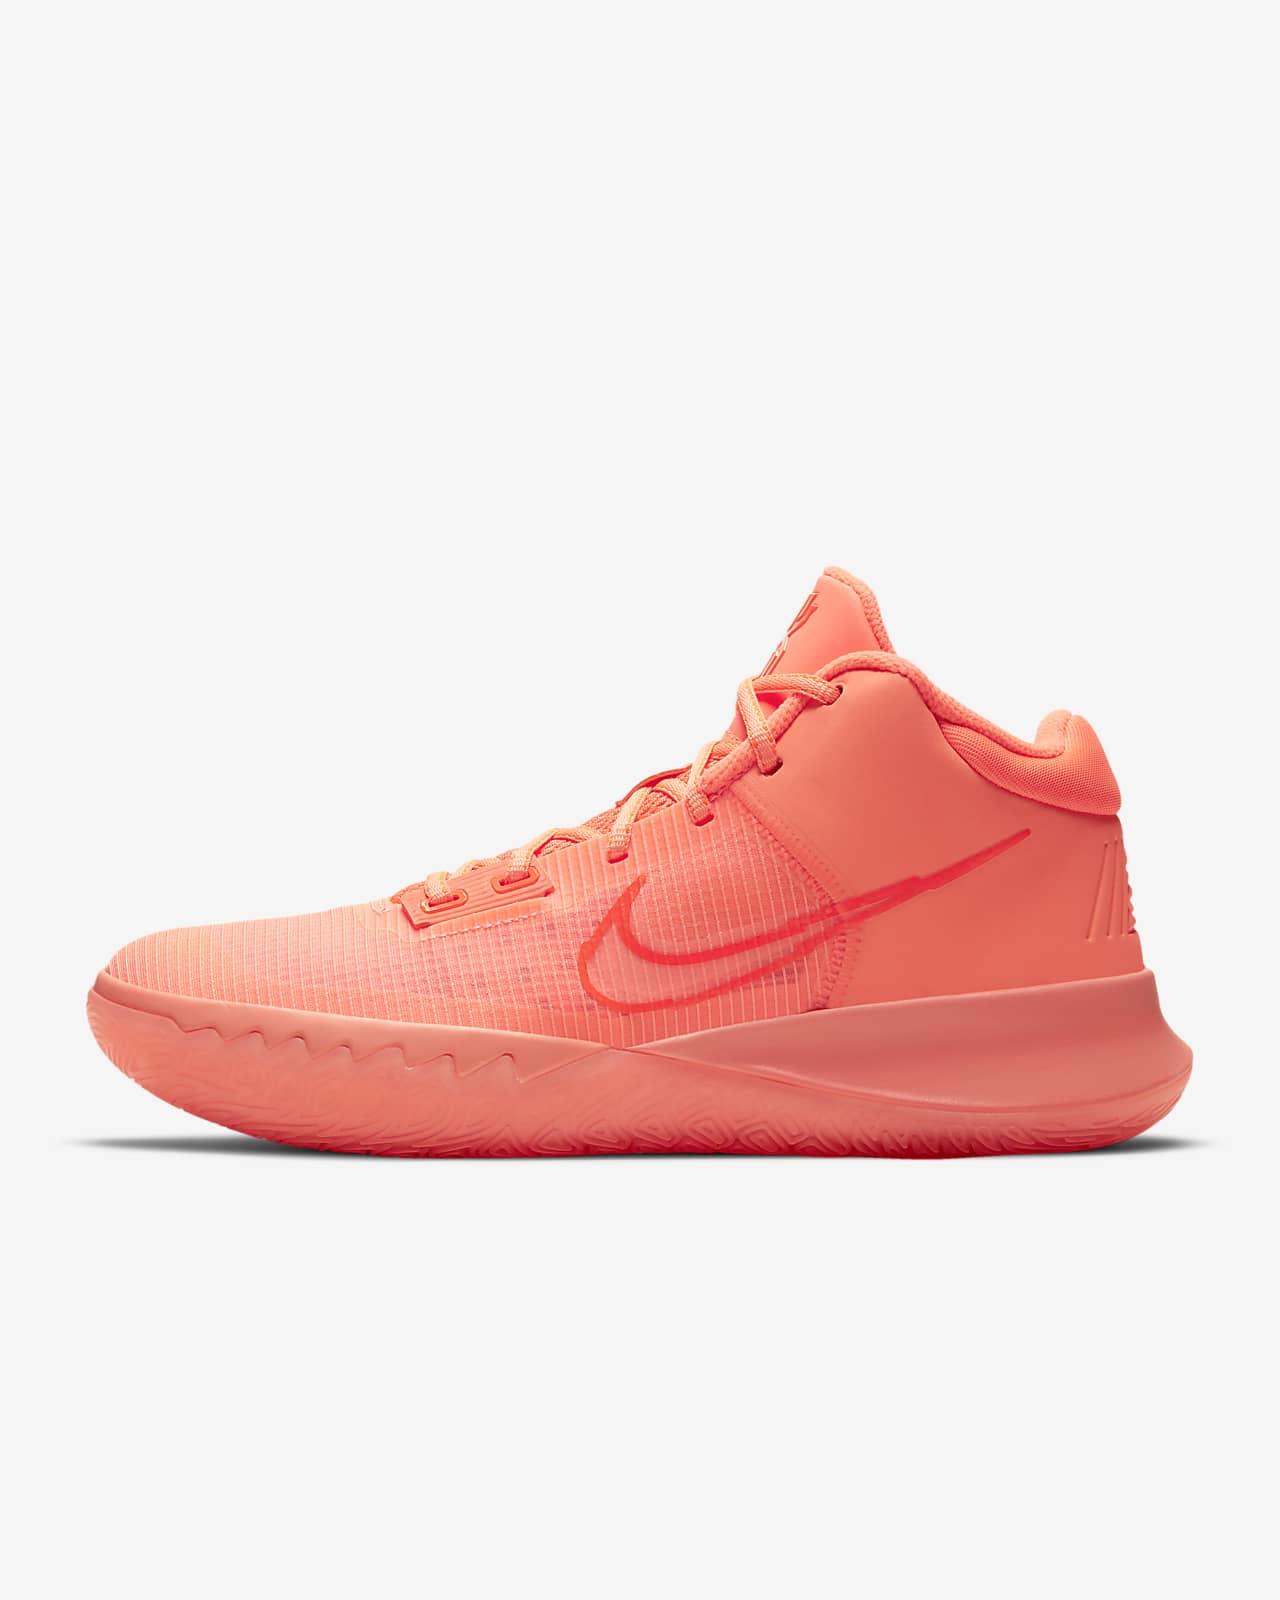 Kyrie Flytrap 4 Basketball Shoe